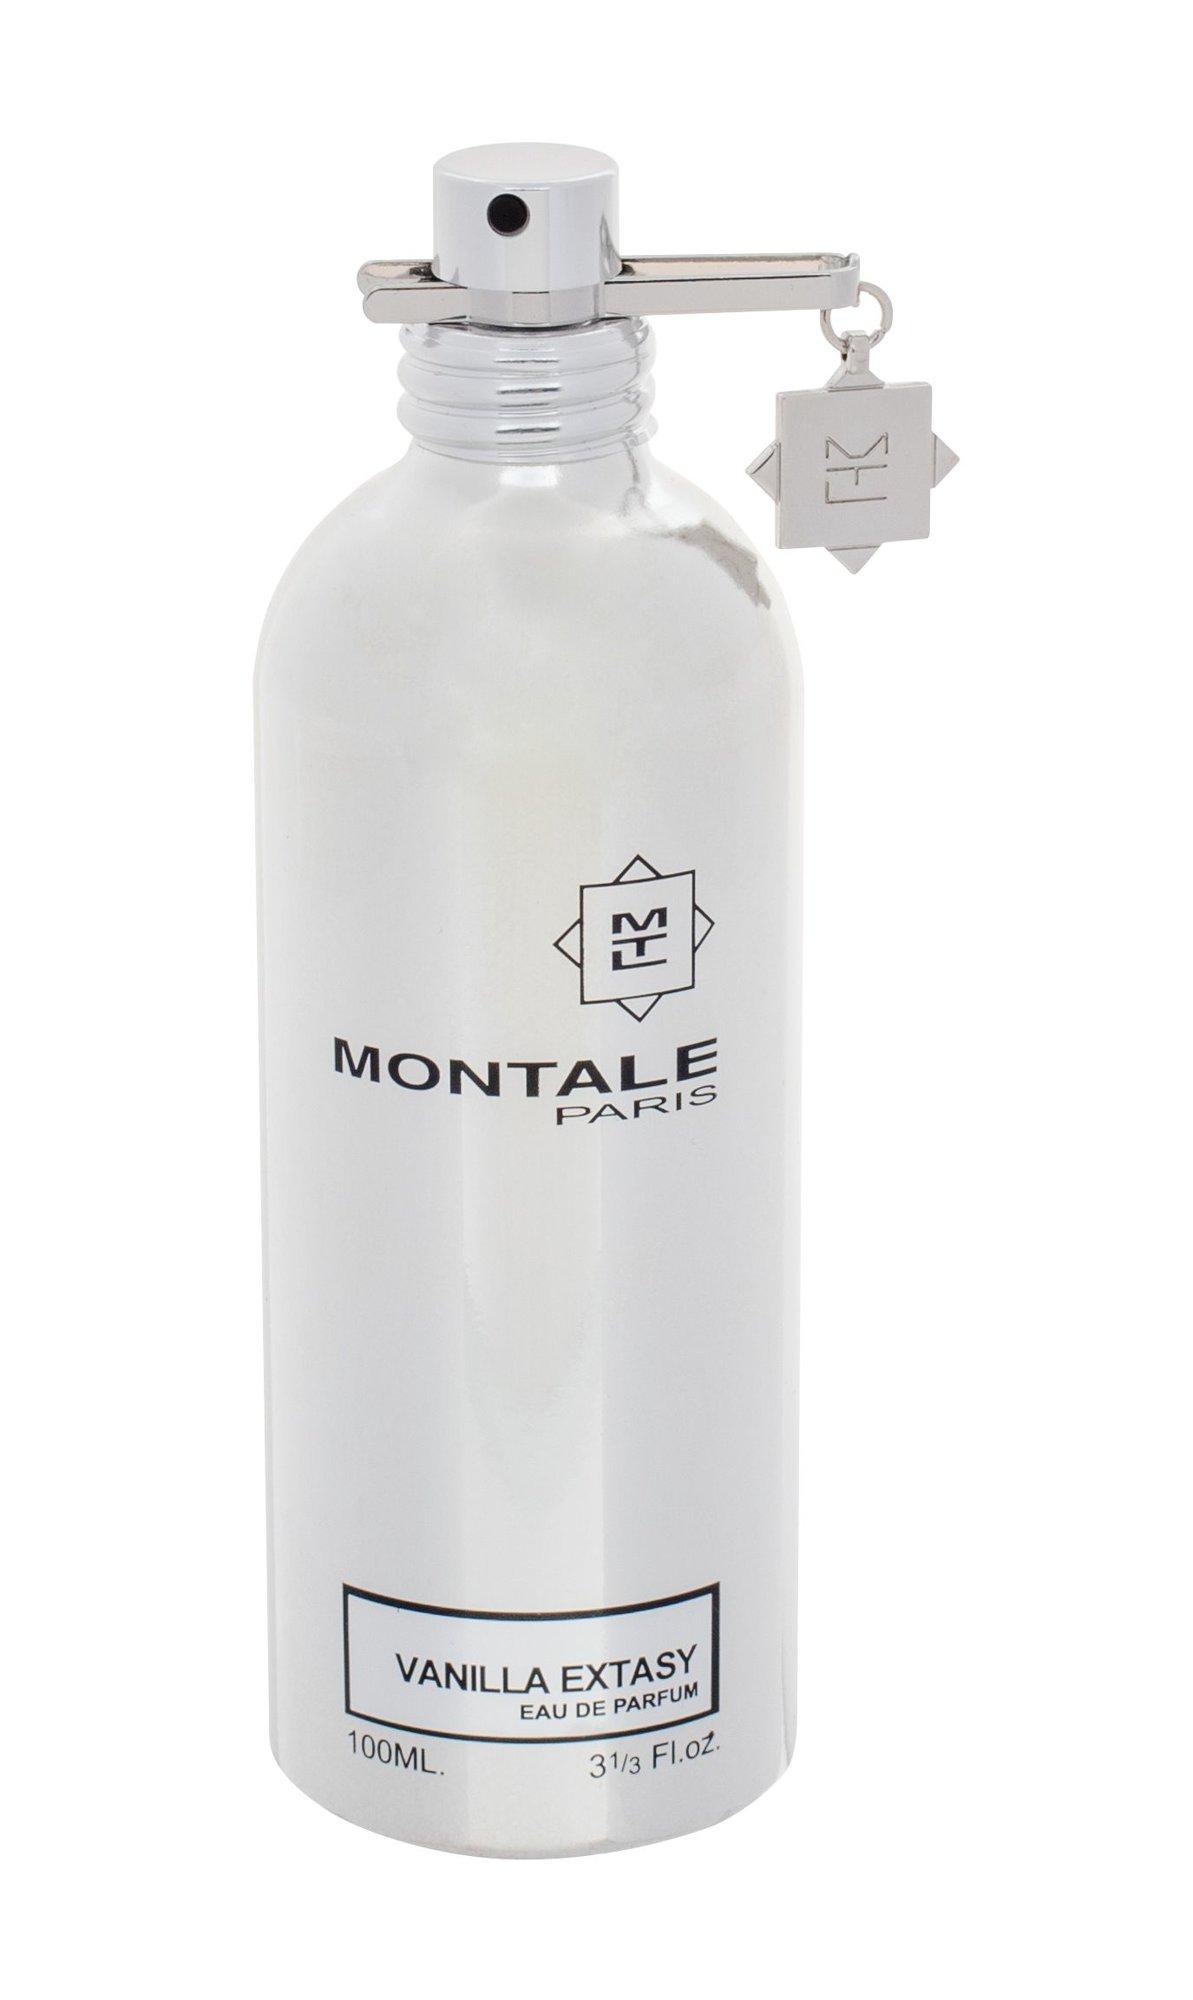 Montale Paris Vanilla Extasy Eau de Parfum 100ml